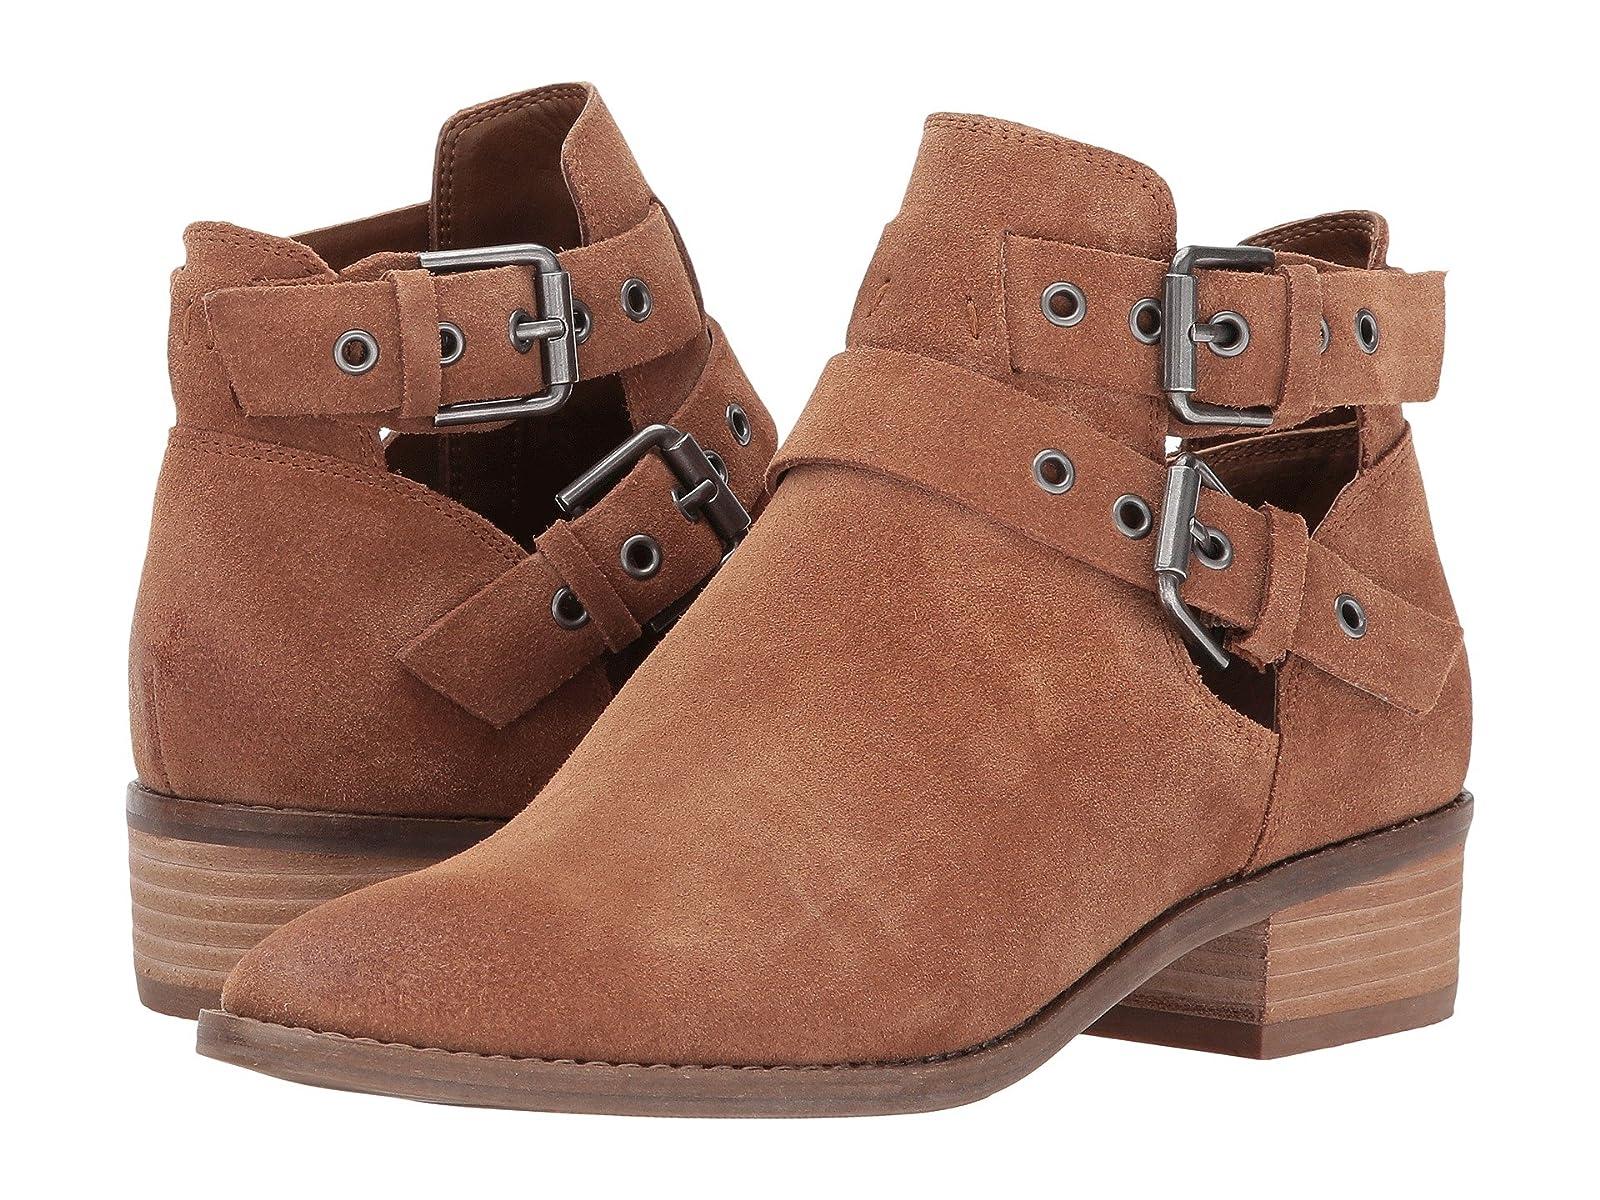 Dolce Vita TanaCheap and distinctive eye-catching shoes